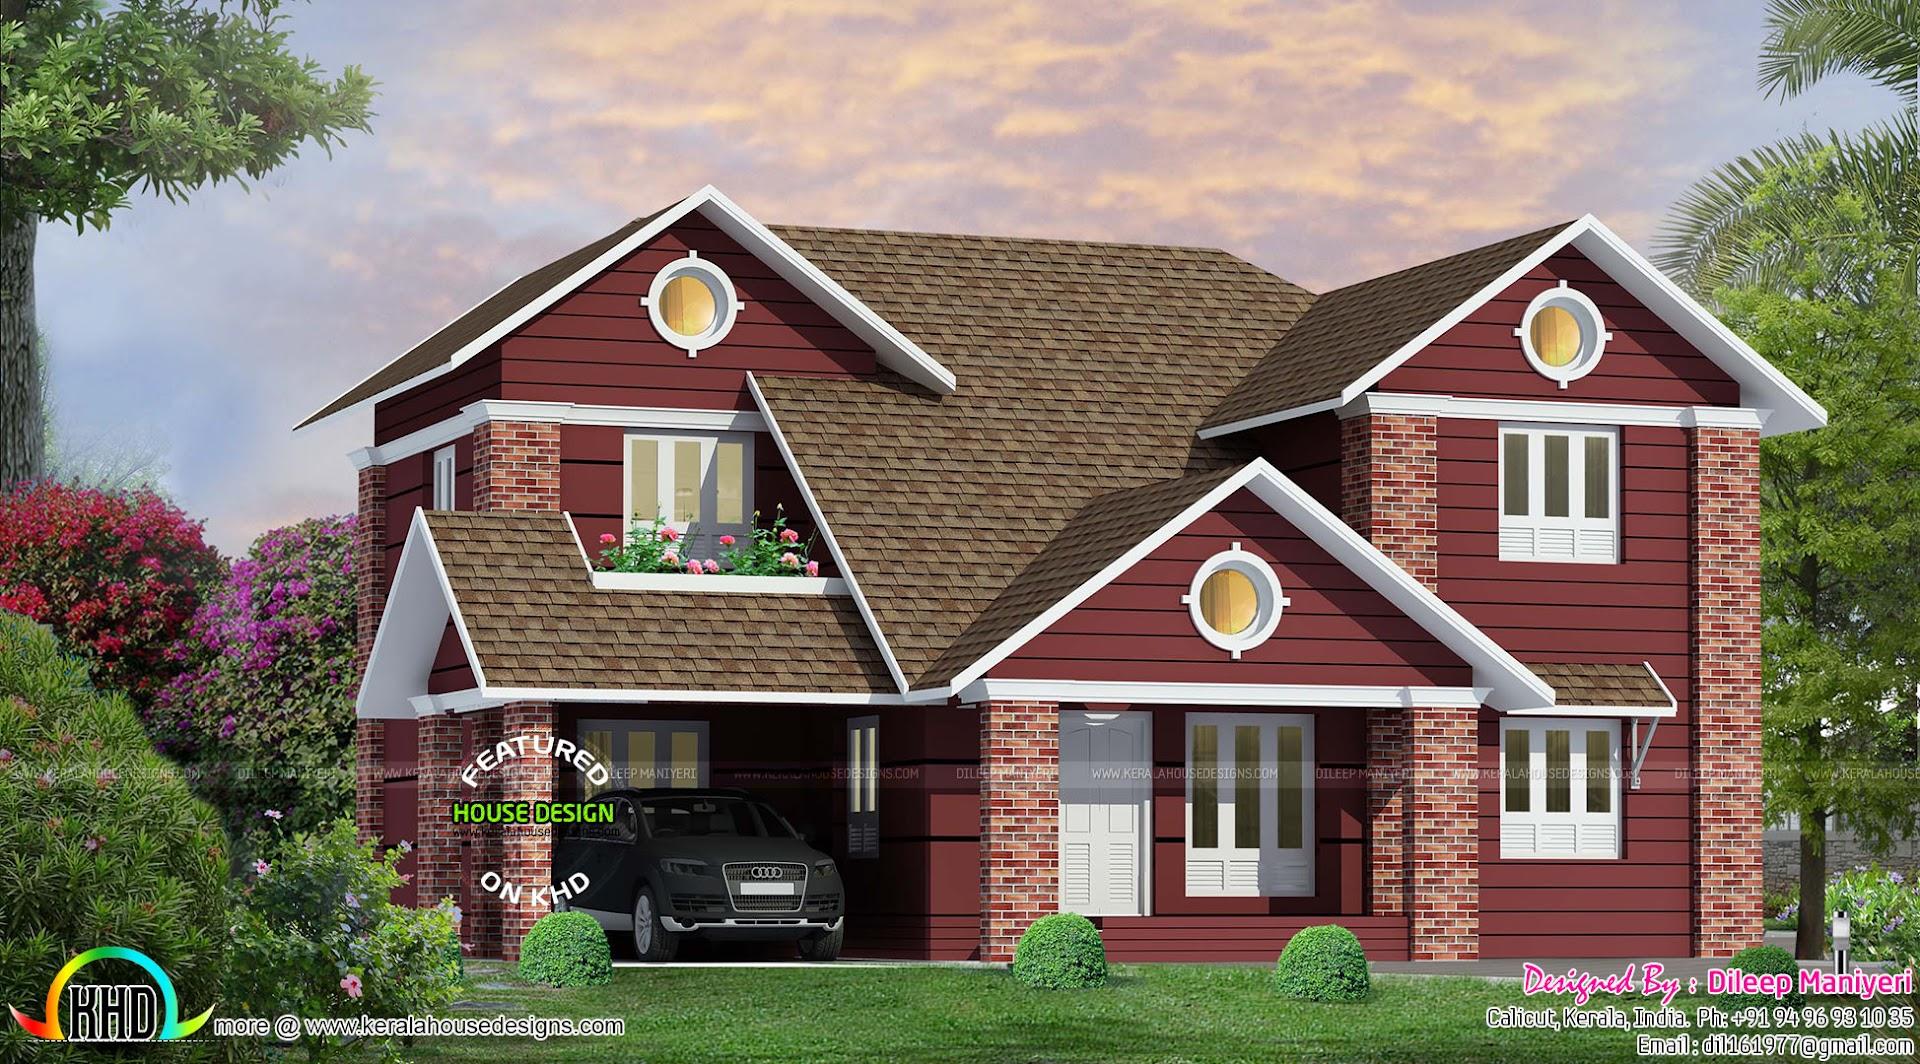 victorian model house kerala kerala home design floor plans victorian style home exterior trim victorian home exterior design